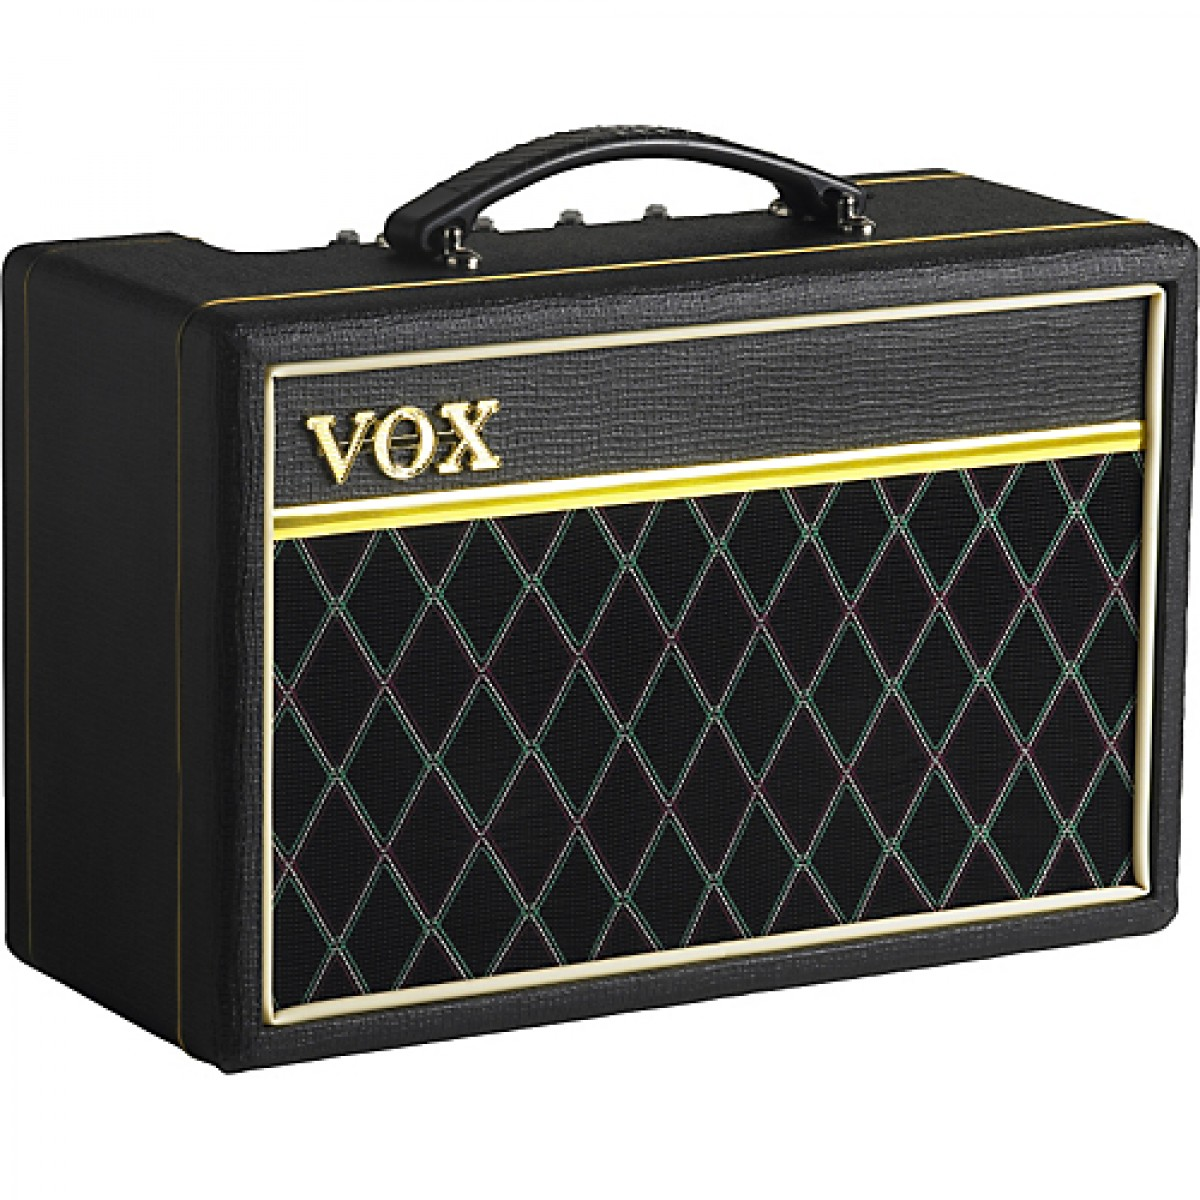 Vox Pathfinder 10 Bass Amp | Buy Bass Guitar Combo Amps